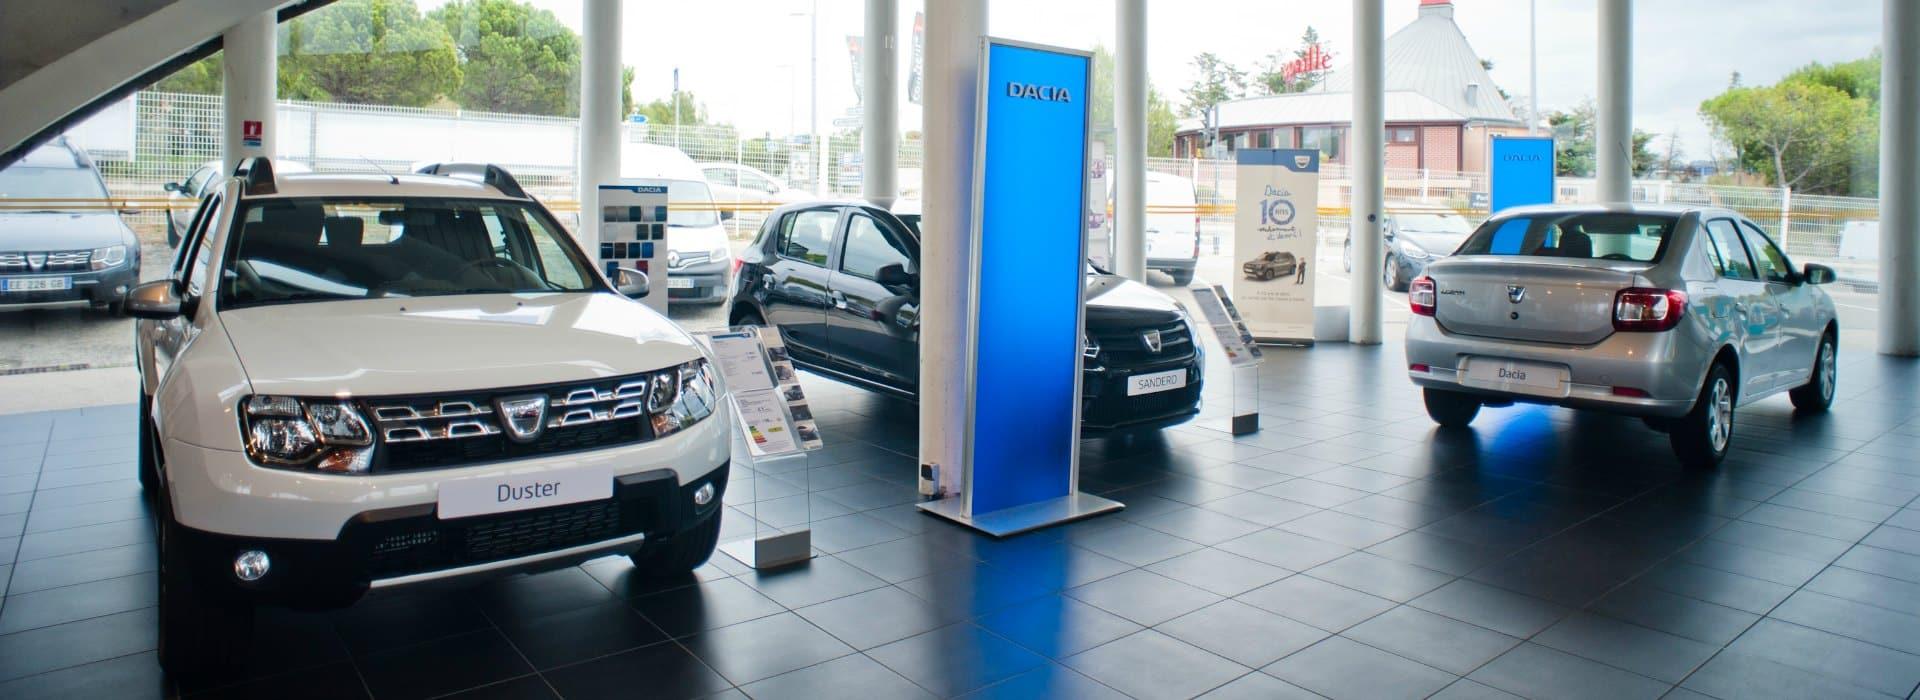 Dacia vitrolles concessionnaire garage bouches du rh ne 13 - Garage mercedes vitrolles ...